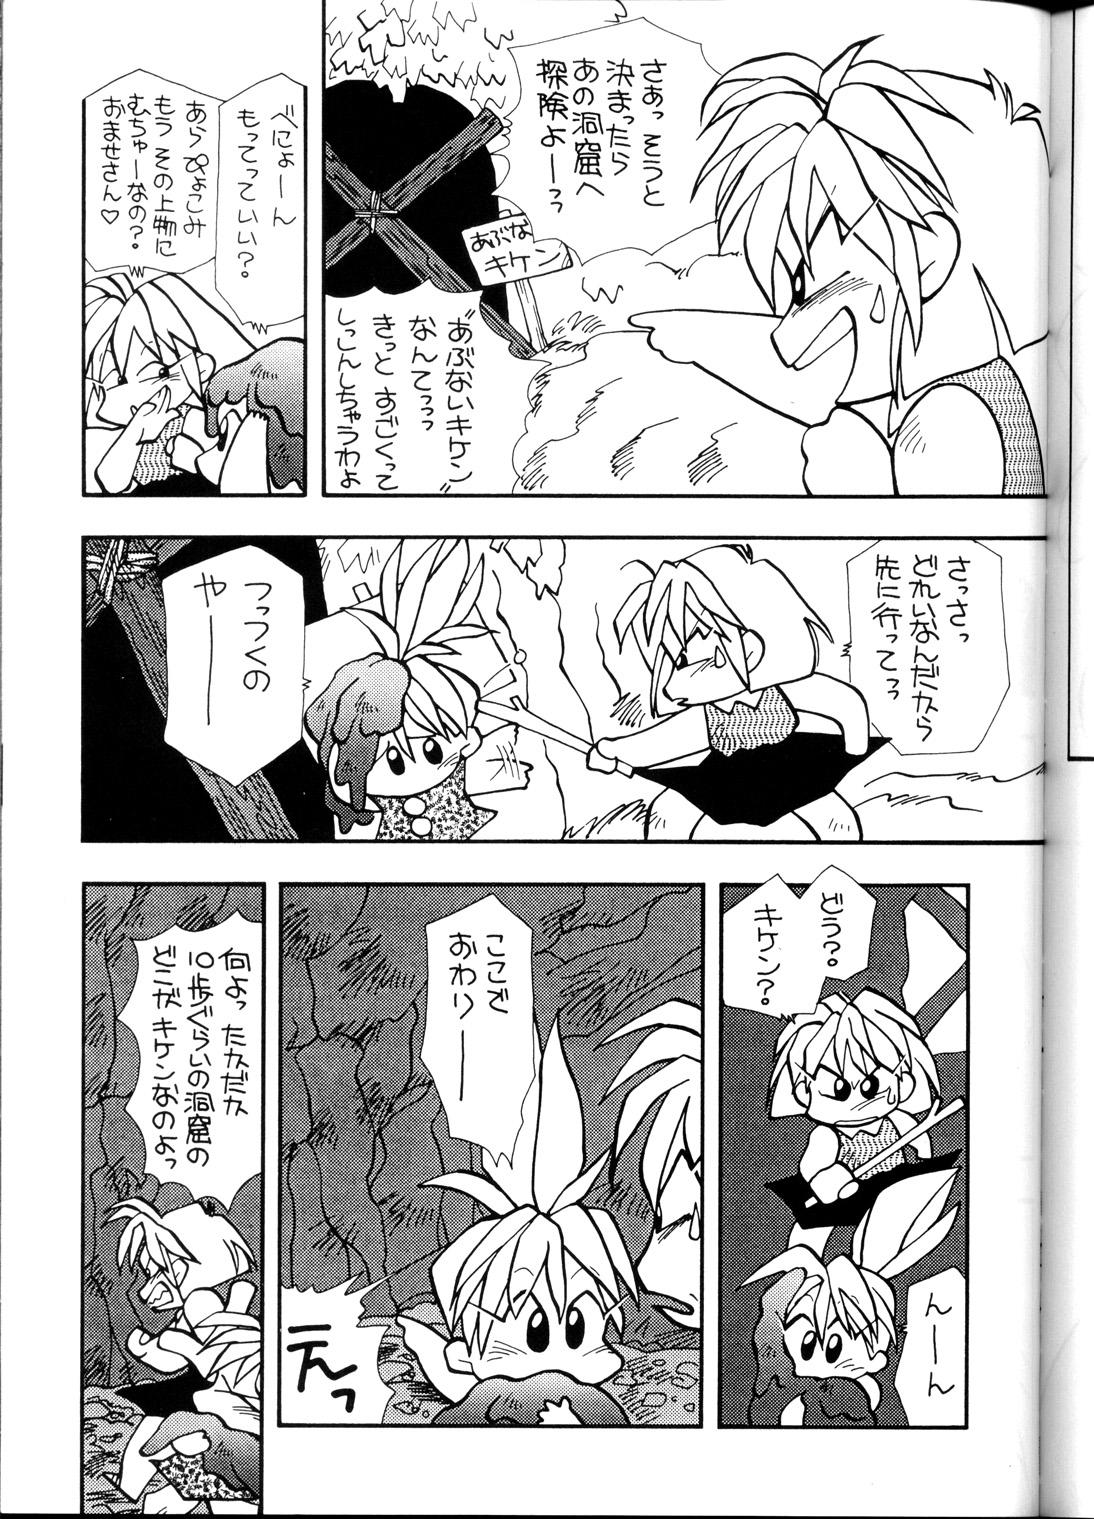 [B.B.C] Tenchi Muyou! Ryou-ou-ki Kaiteiben (Tenchi Muyou!) 59